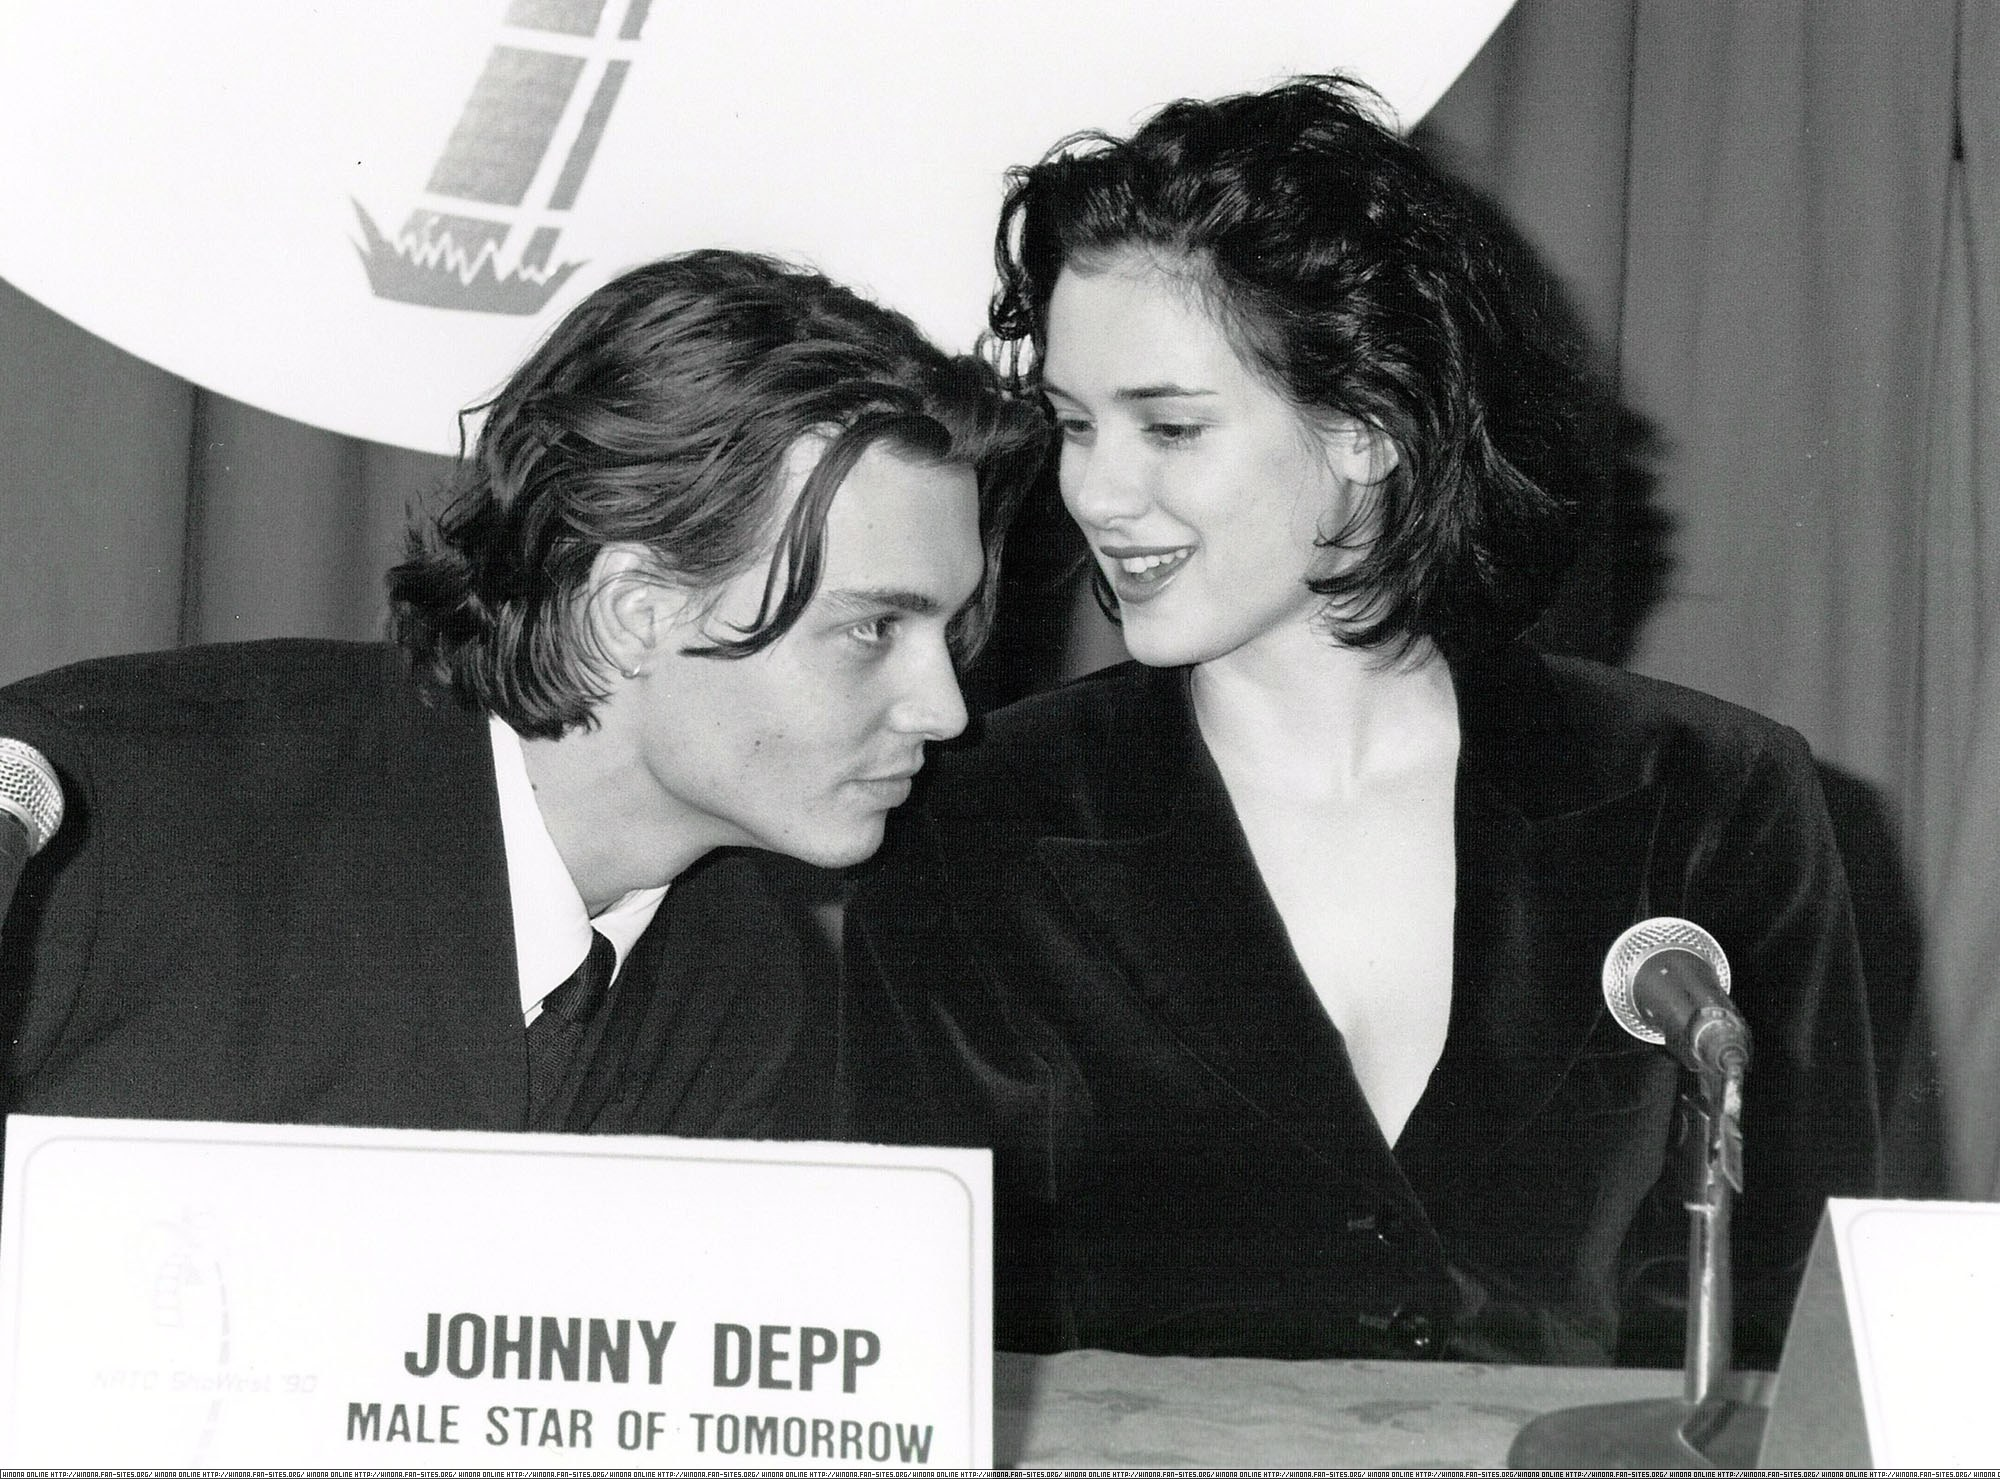 Скачать johnny depp, актер, мужчина, секс символ, супер, фото, обои